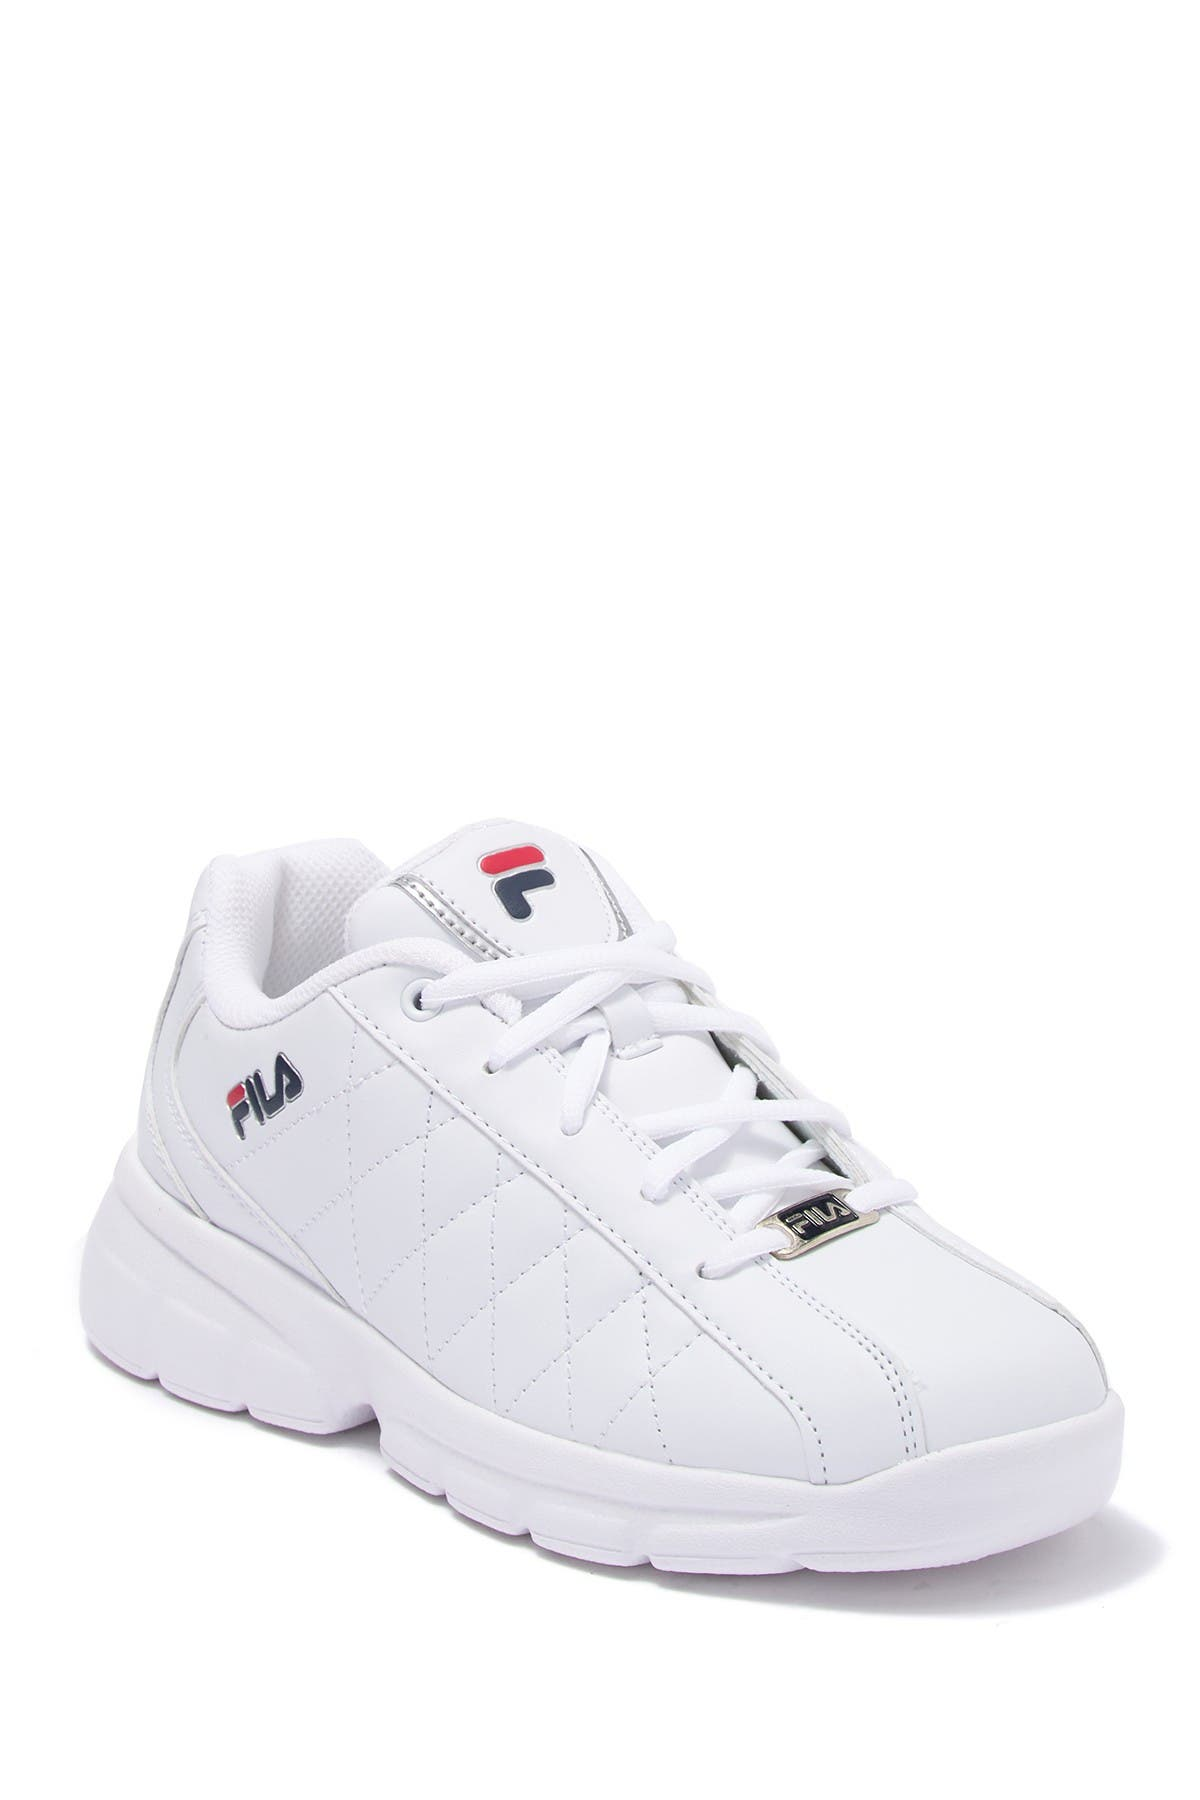 FILA USA | Fulcrum 3 Sneaker